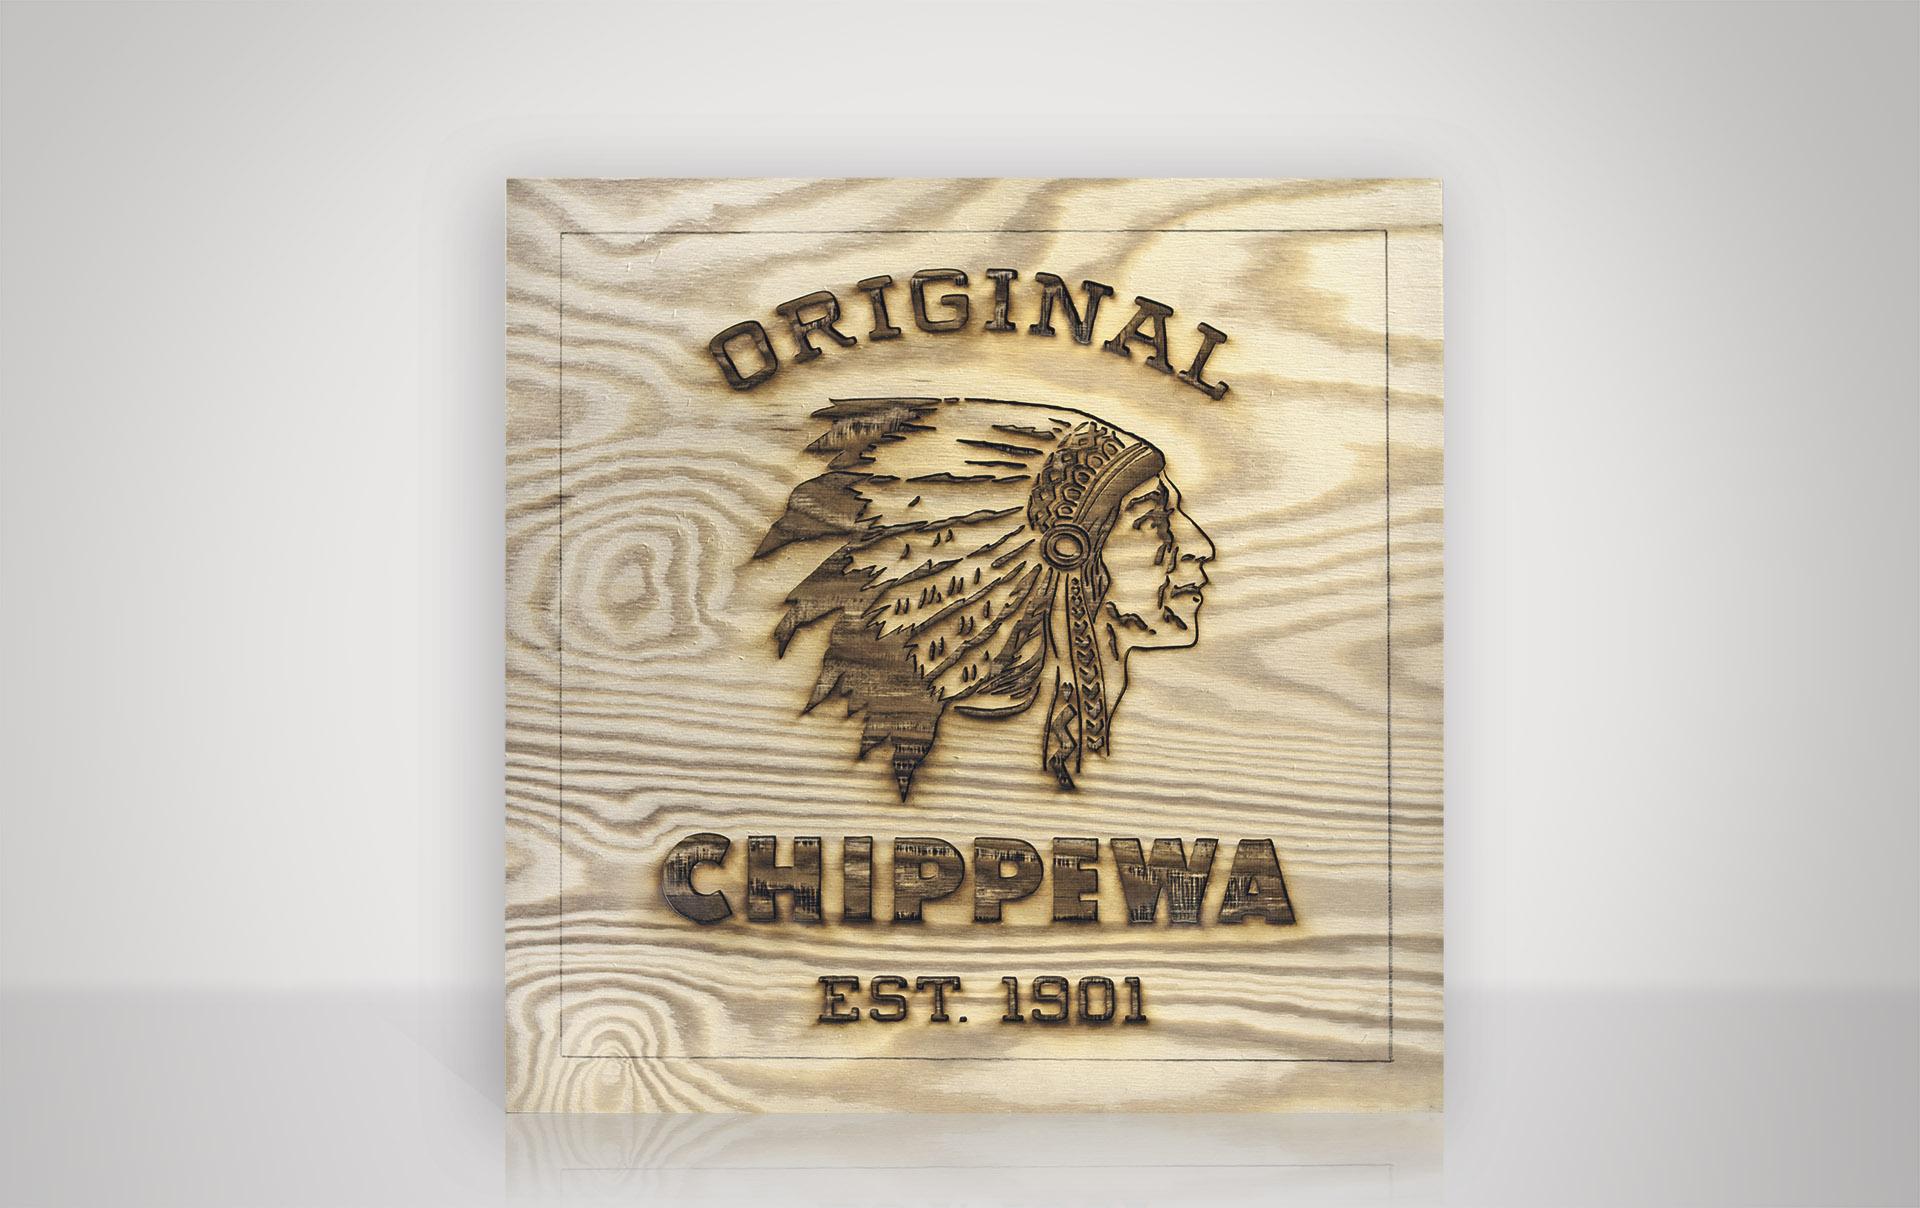 Chippewa Logo Holz Lasergravur,Lasergravur in Holz, Schuhhersteller, Holzbearbeitung, Innenausbau, Möbel, interior, Design, gestaltung, grafik, indianer, native american, first nation american